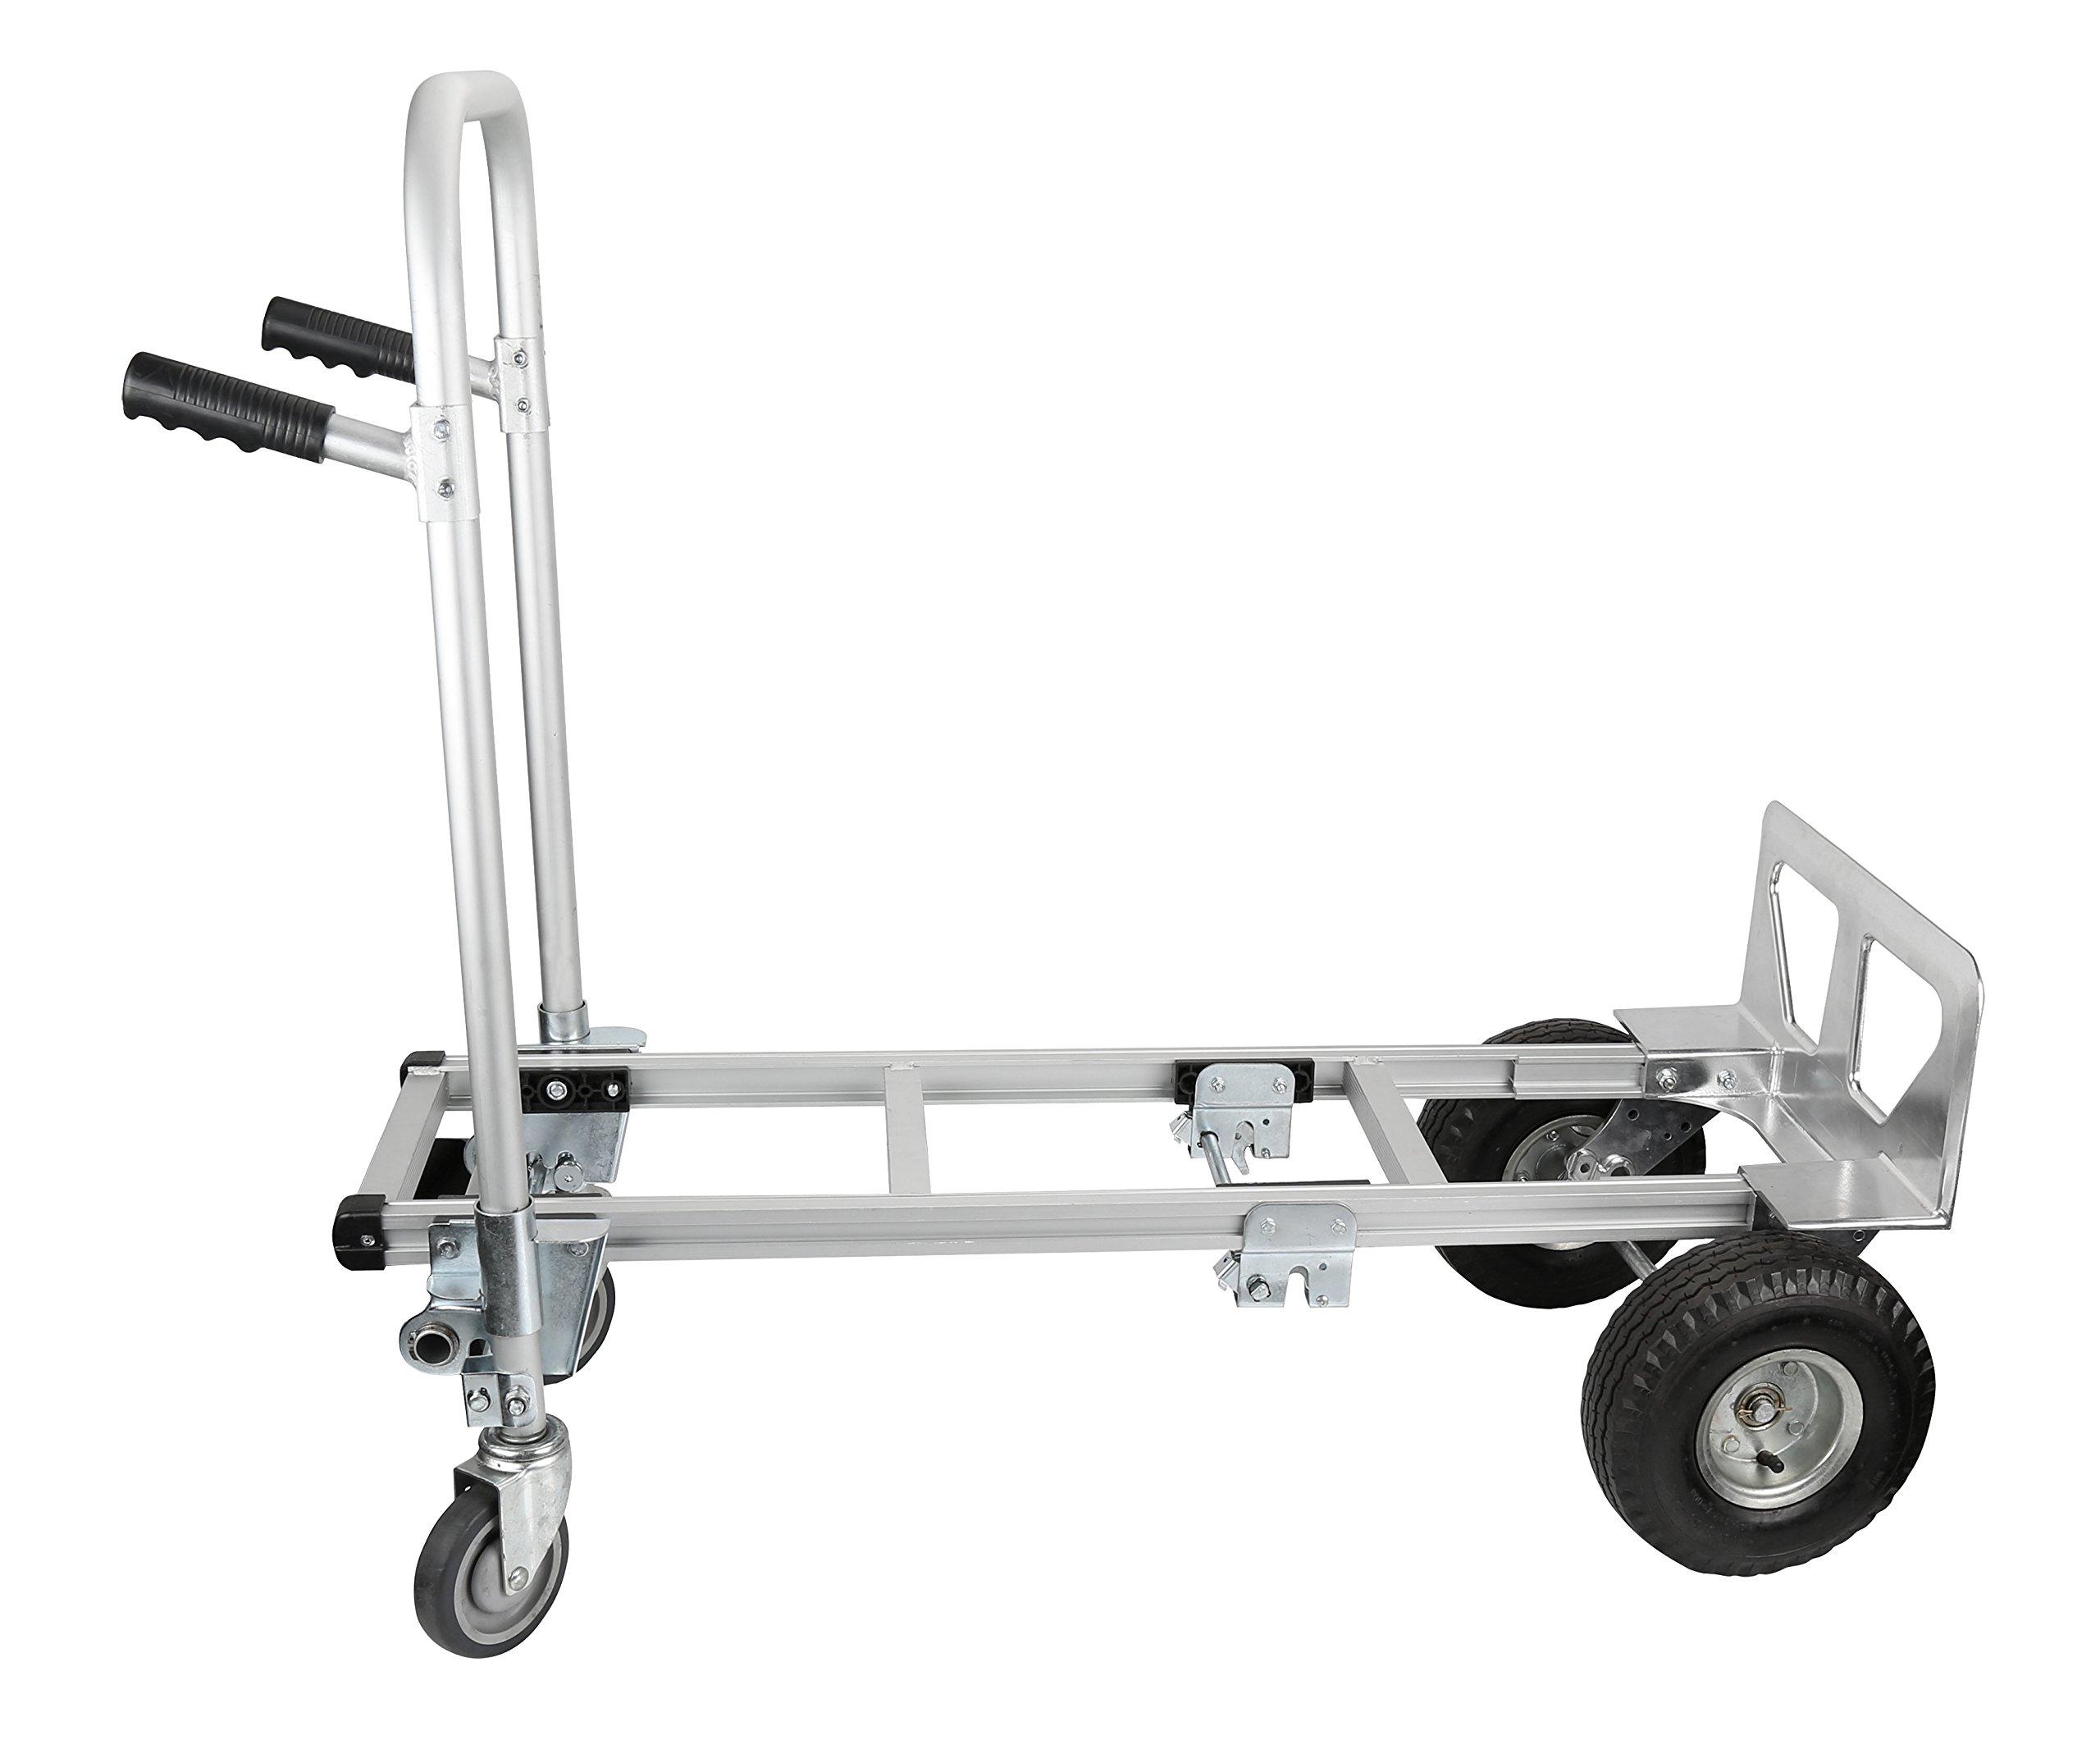 b4e2c451d792 Pack-N-Roll 83-295-917 Convertible Aluminum Hand Truck Dolly